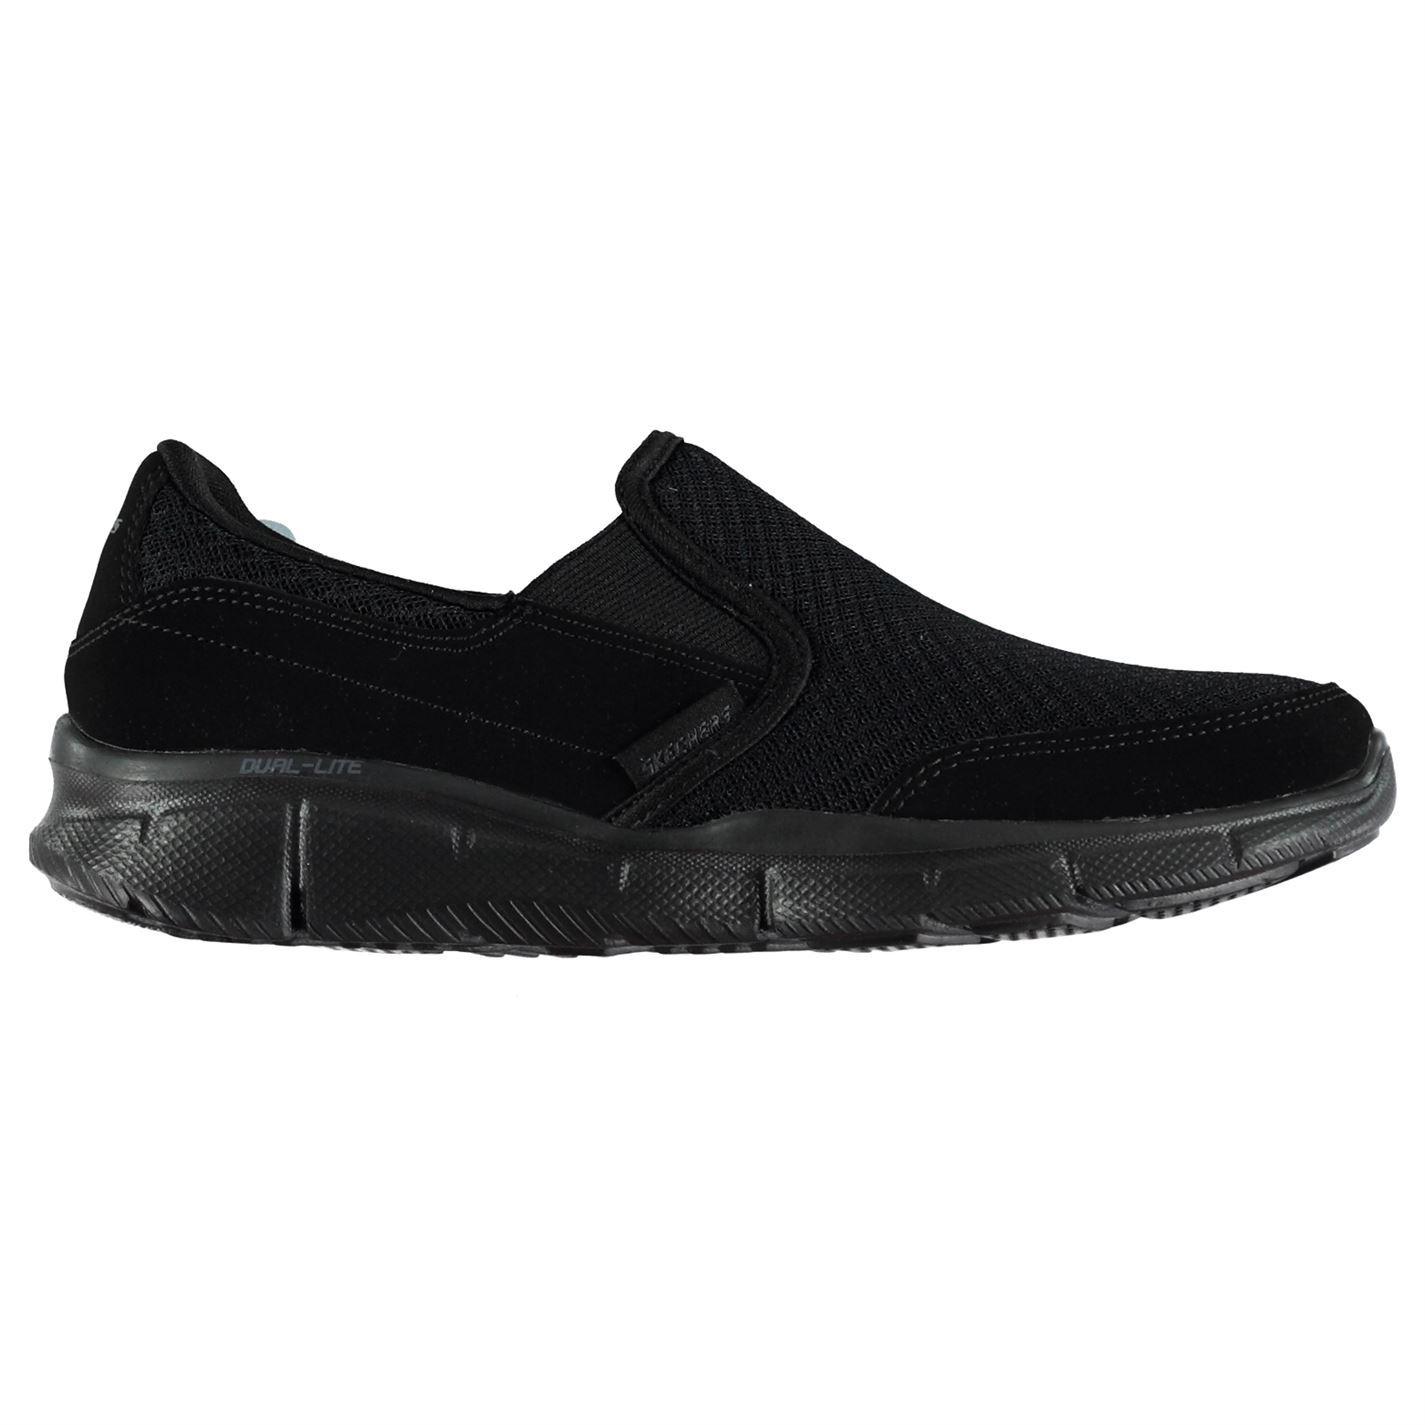 lacoste shoes 305 40 24 ebay